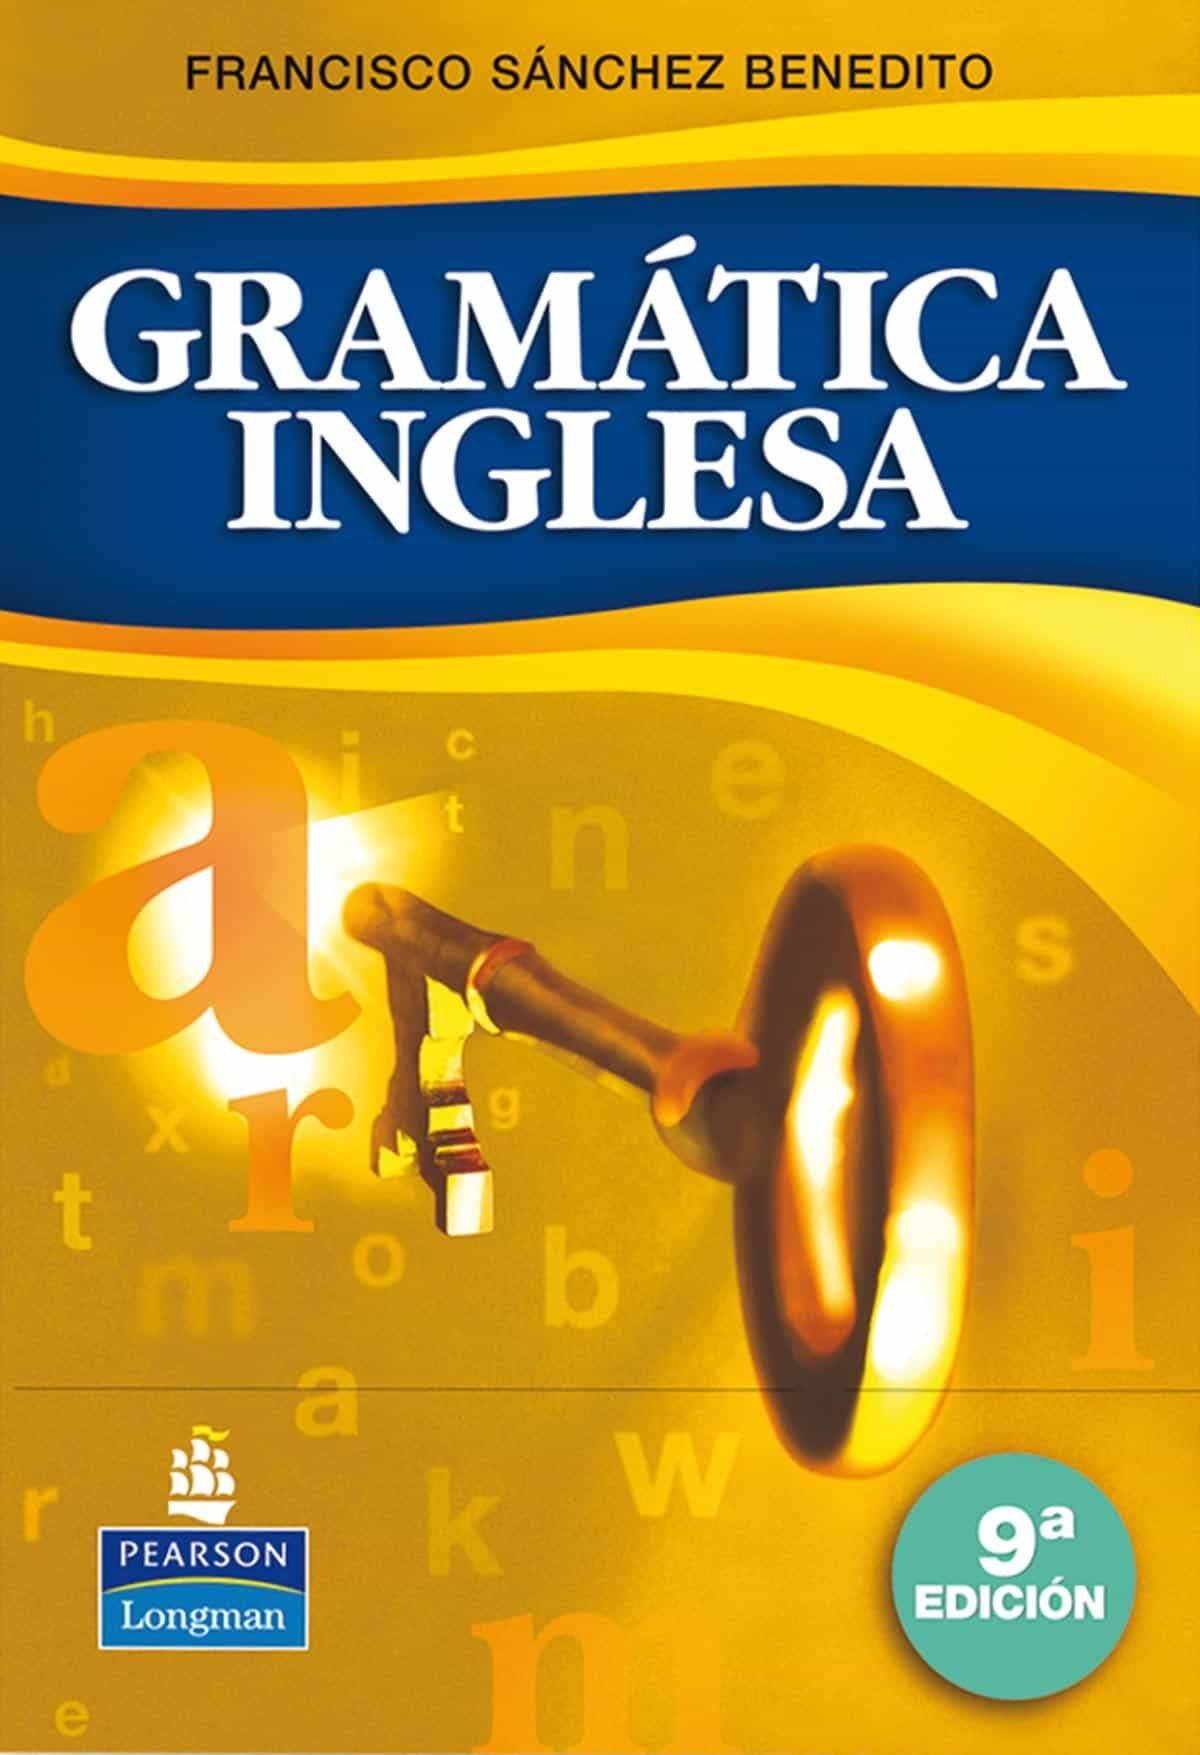 Gramatica Inglesa (9ªed.) - Sanchez Benedito Francisco